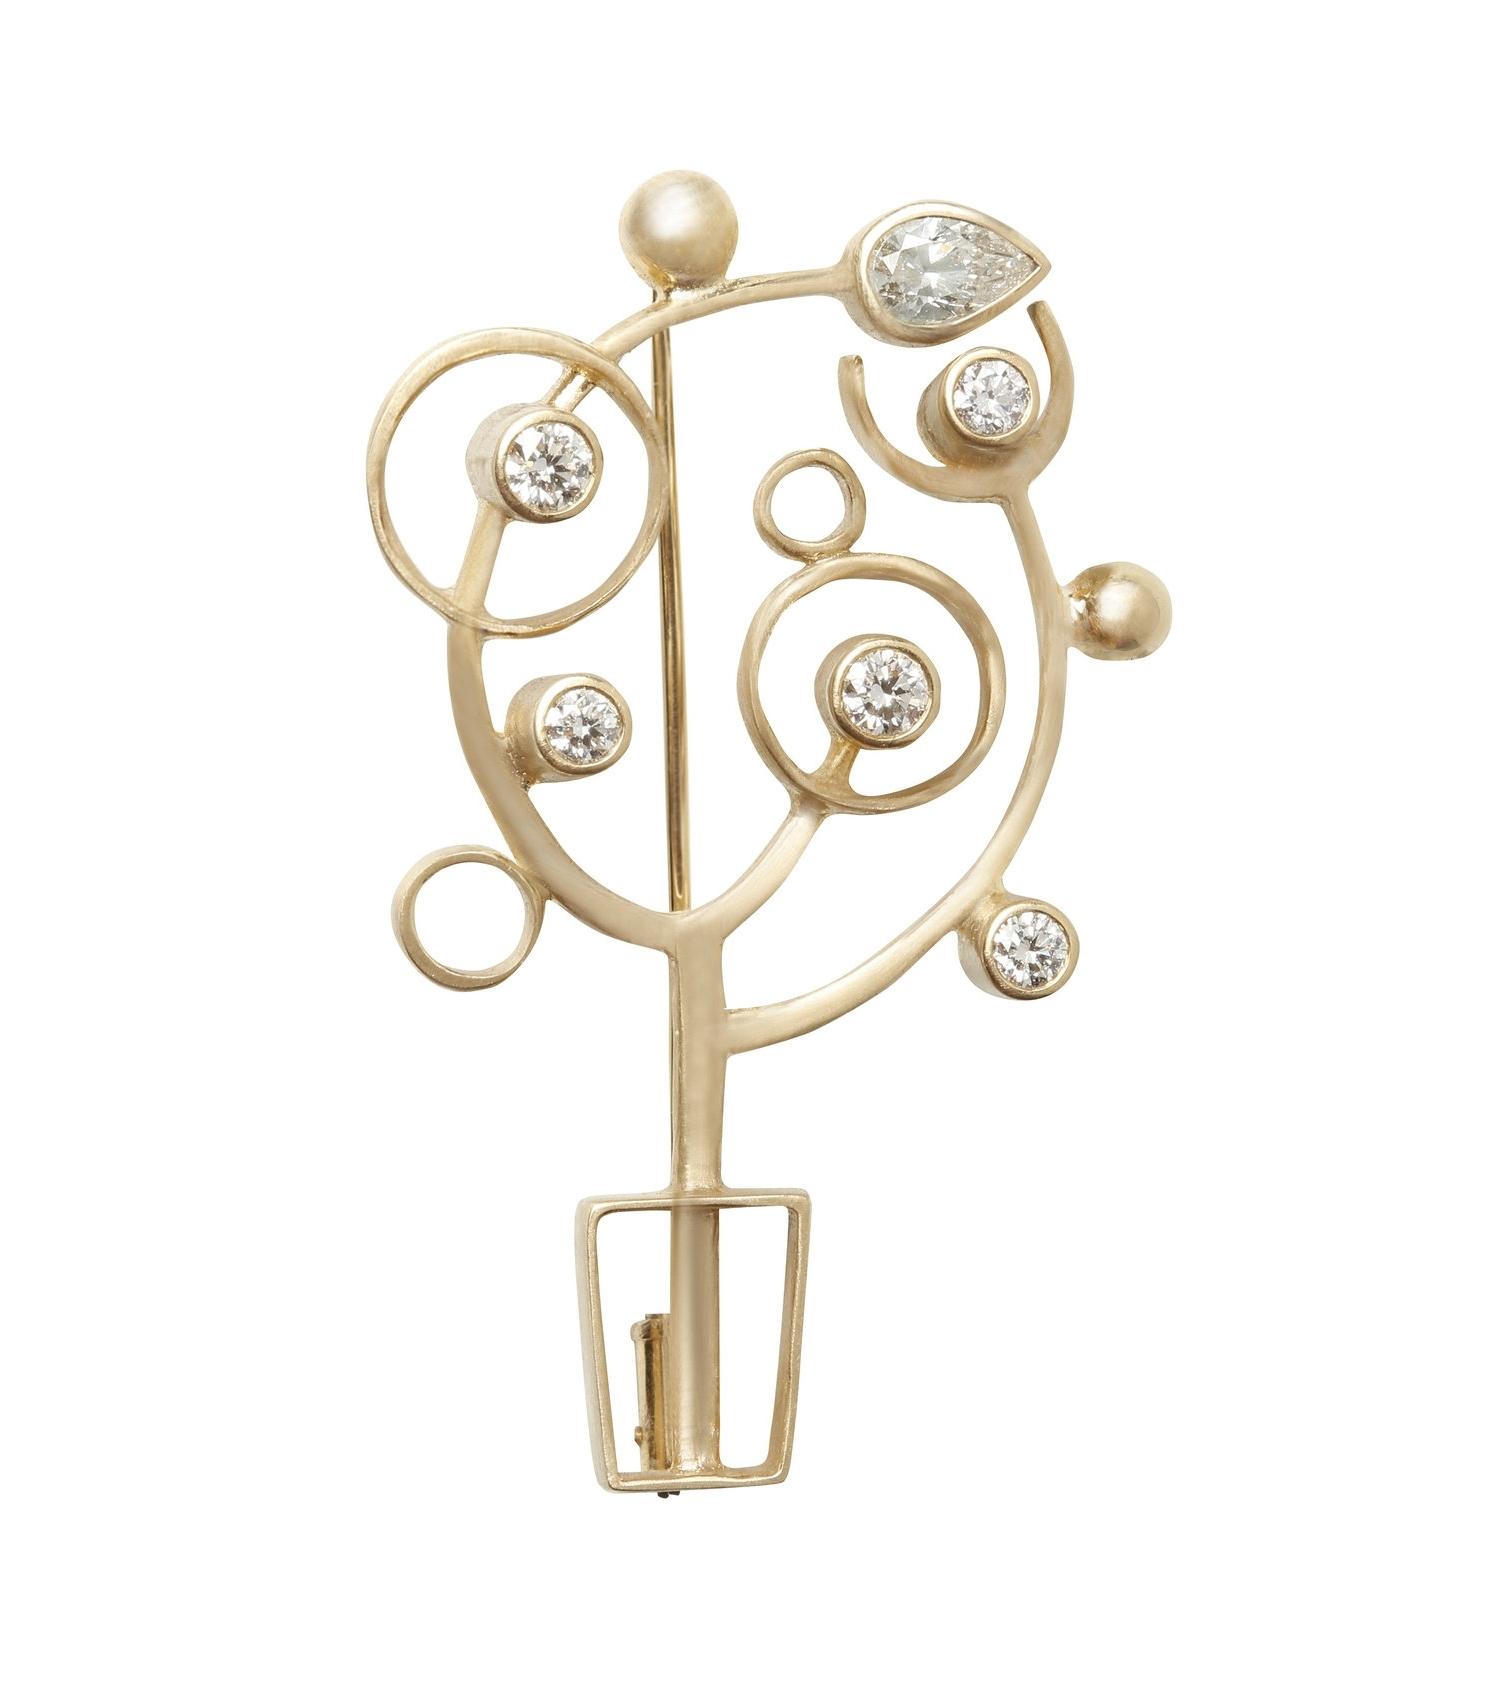 shining tree _ brooch, 18K yellow gold, diamonds